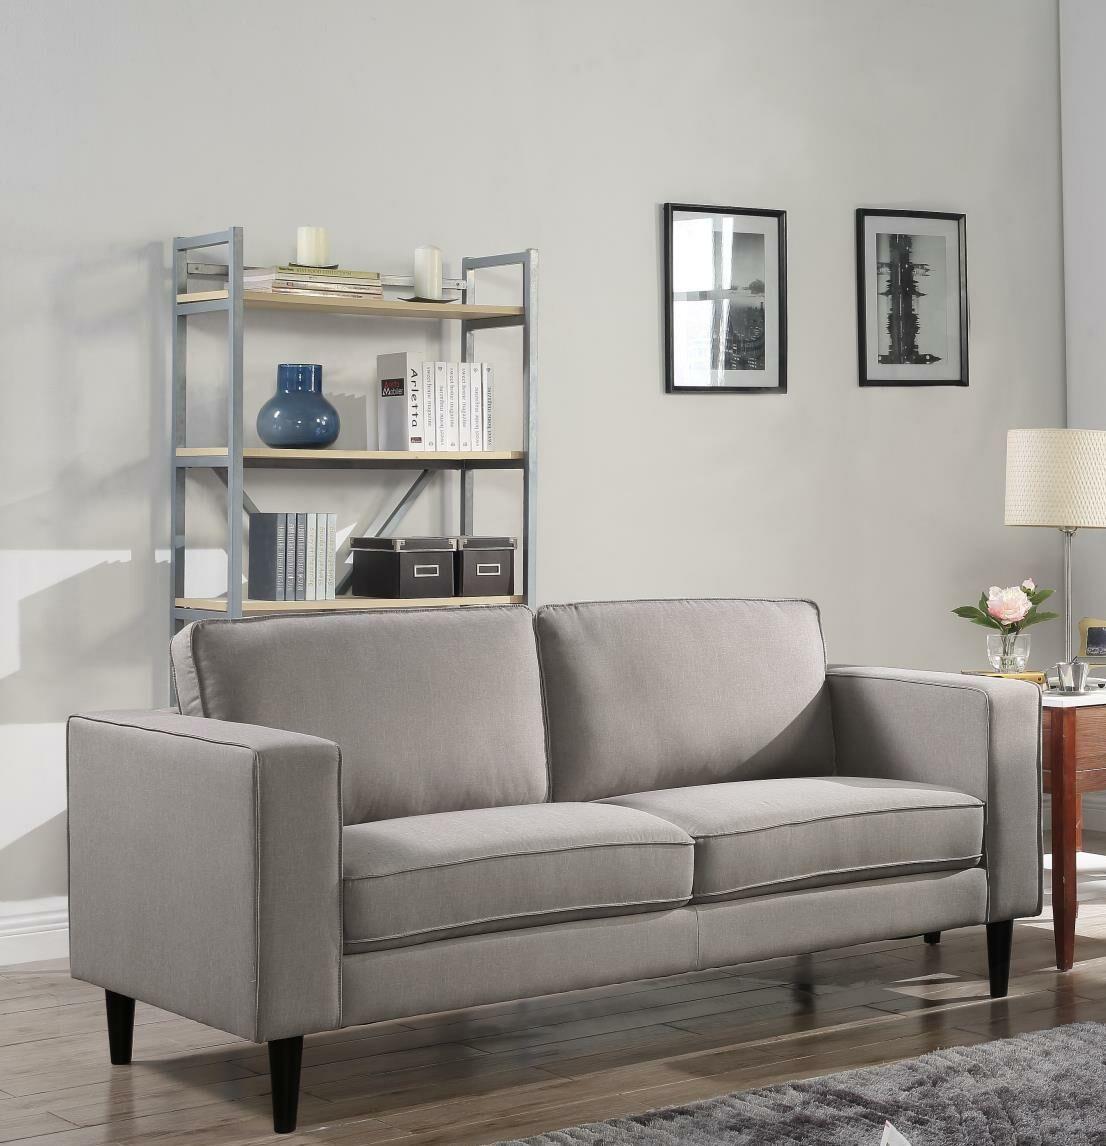 Demps Sofa Upholstery: Beige